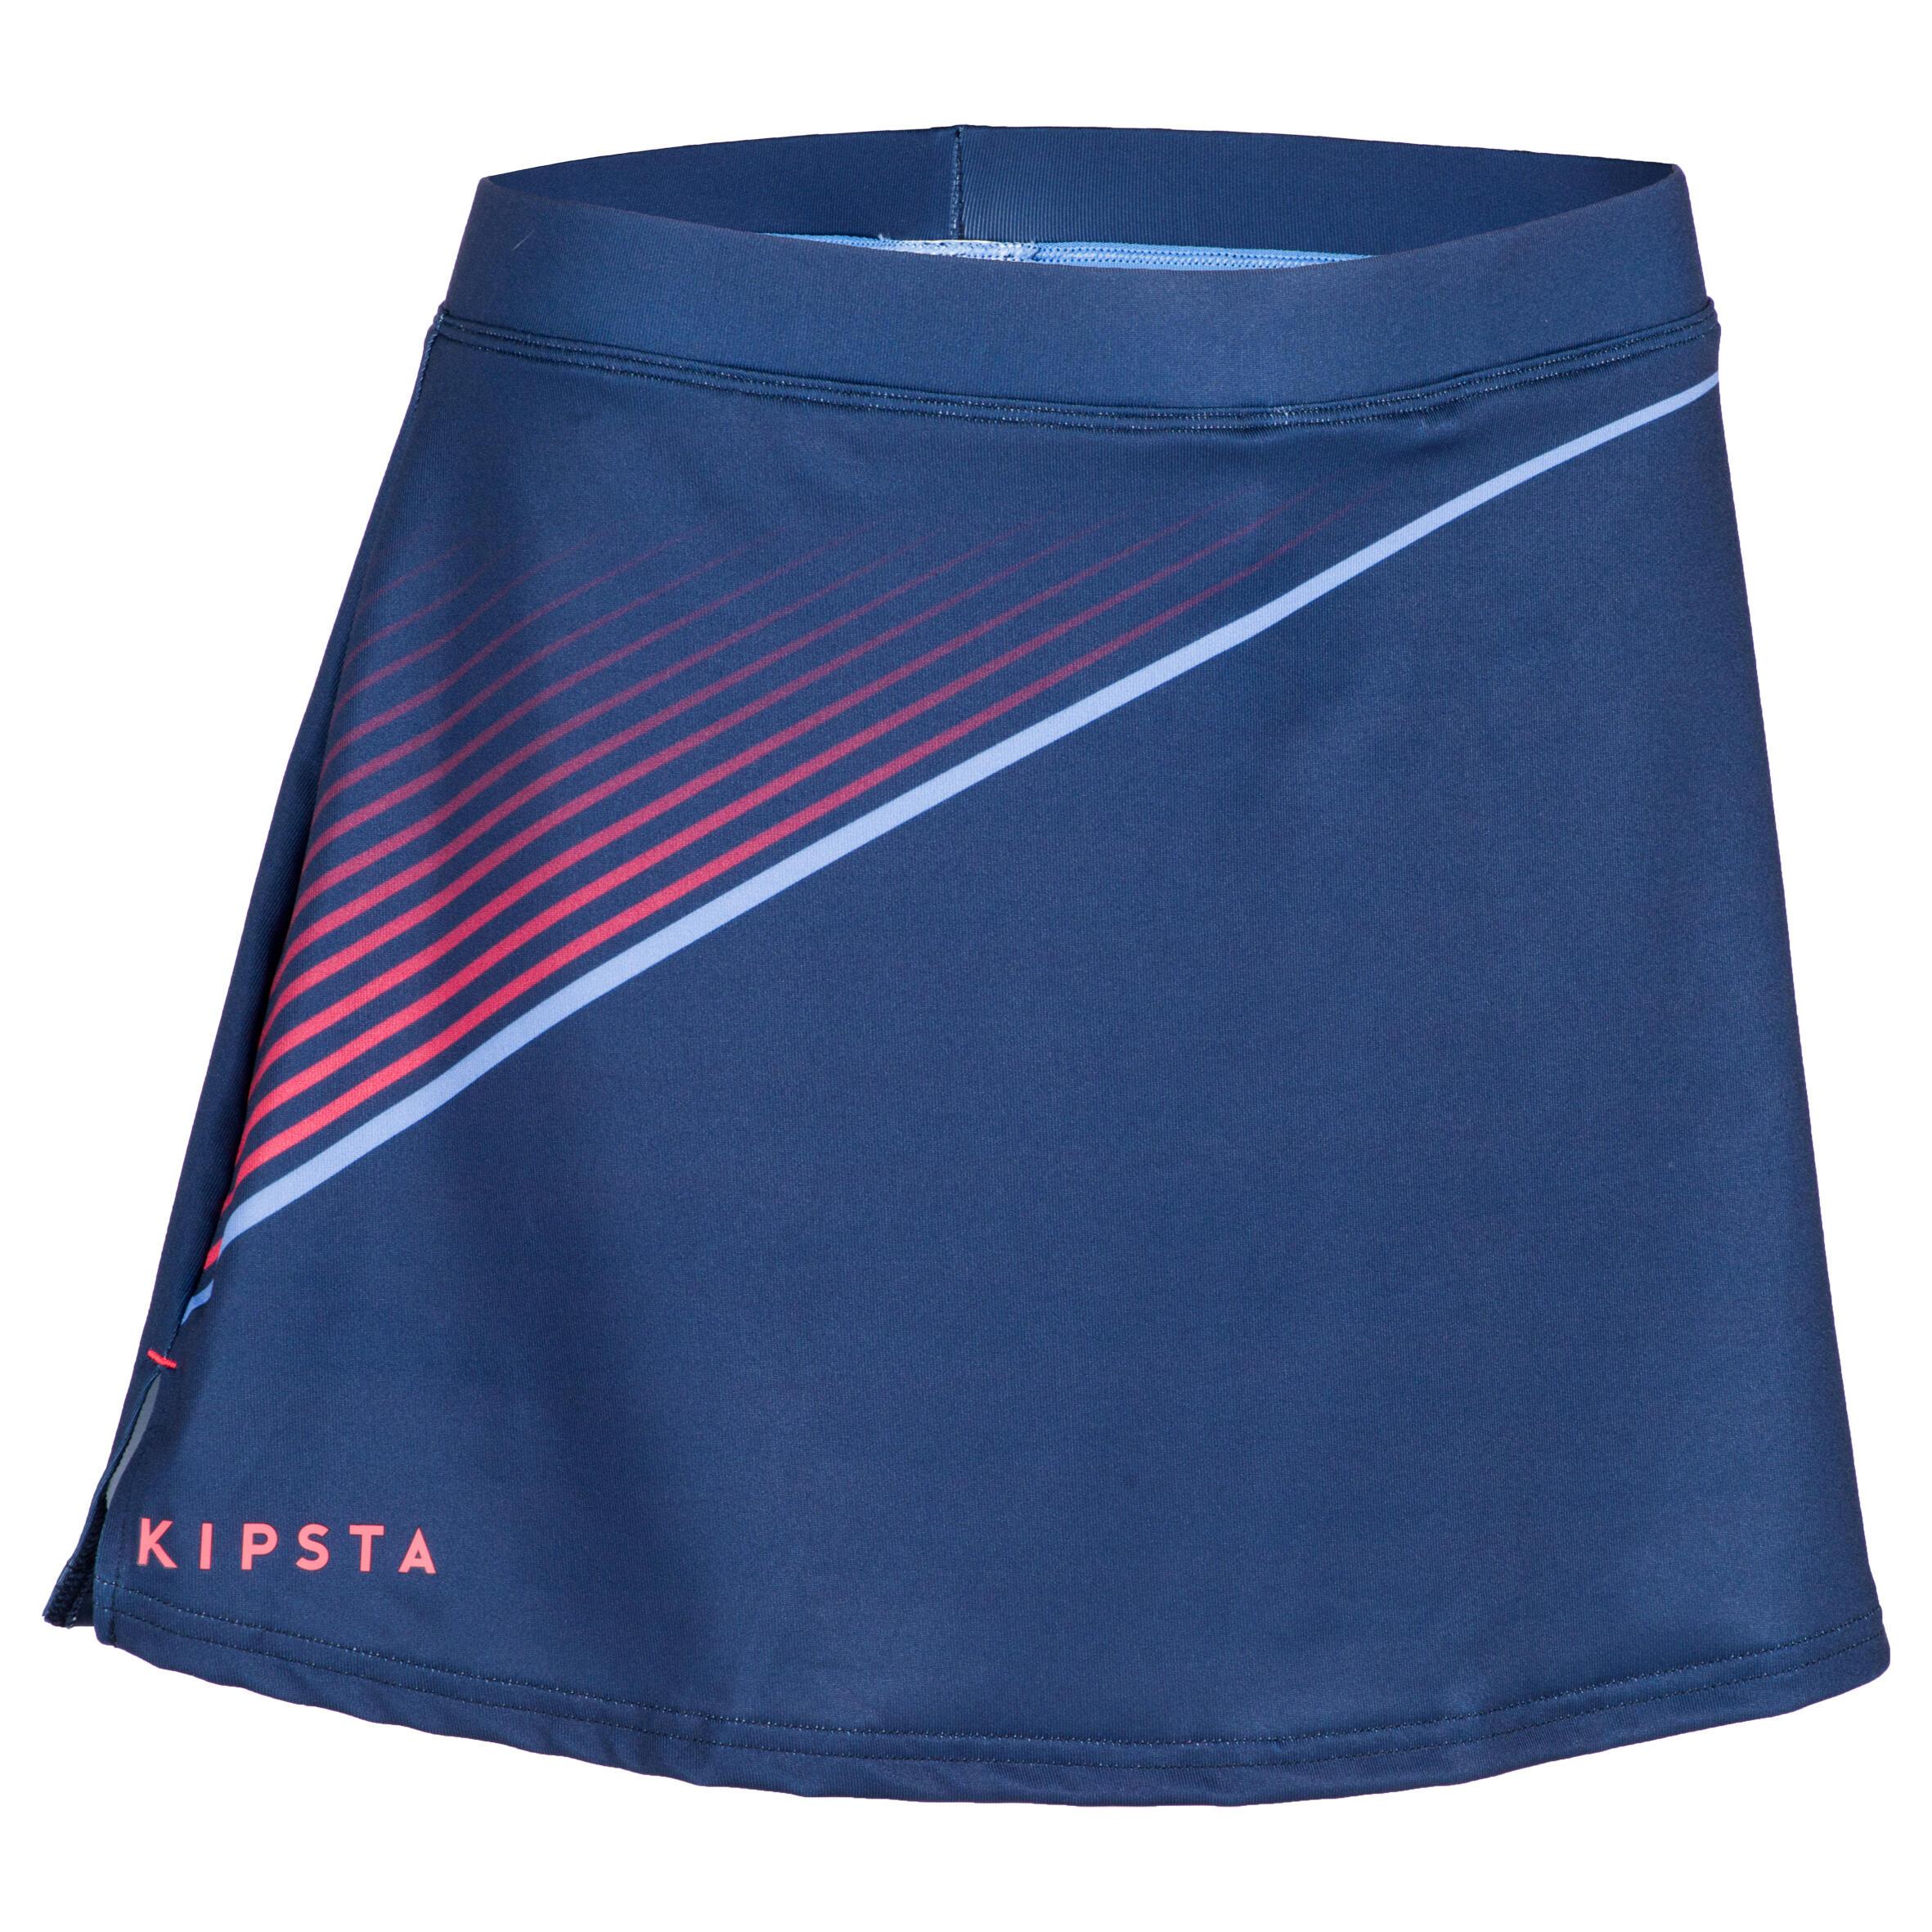 Feldhockey-Rock FH500 Damen blau | Sportbekleidung > Sportröcke | Blau | Trikot | Kipsta